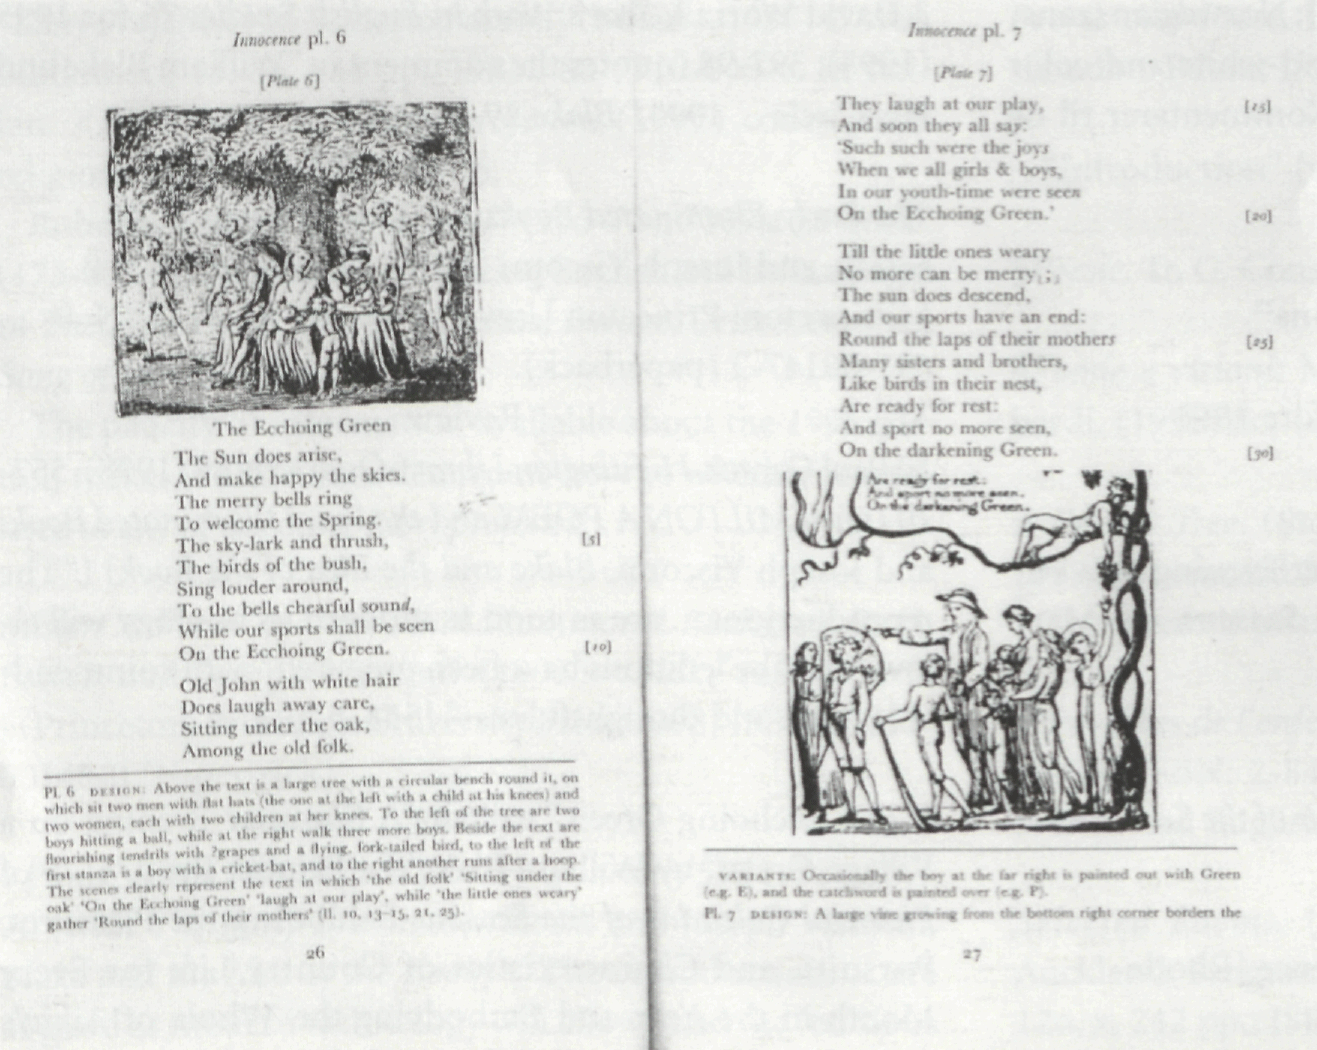 gunnard landers biography of william